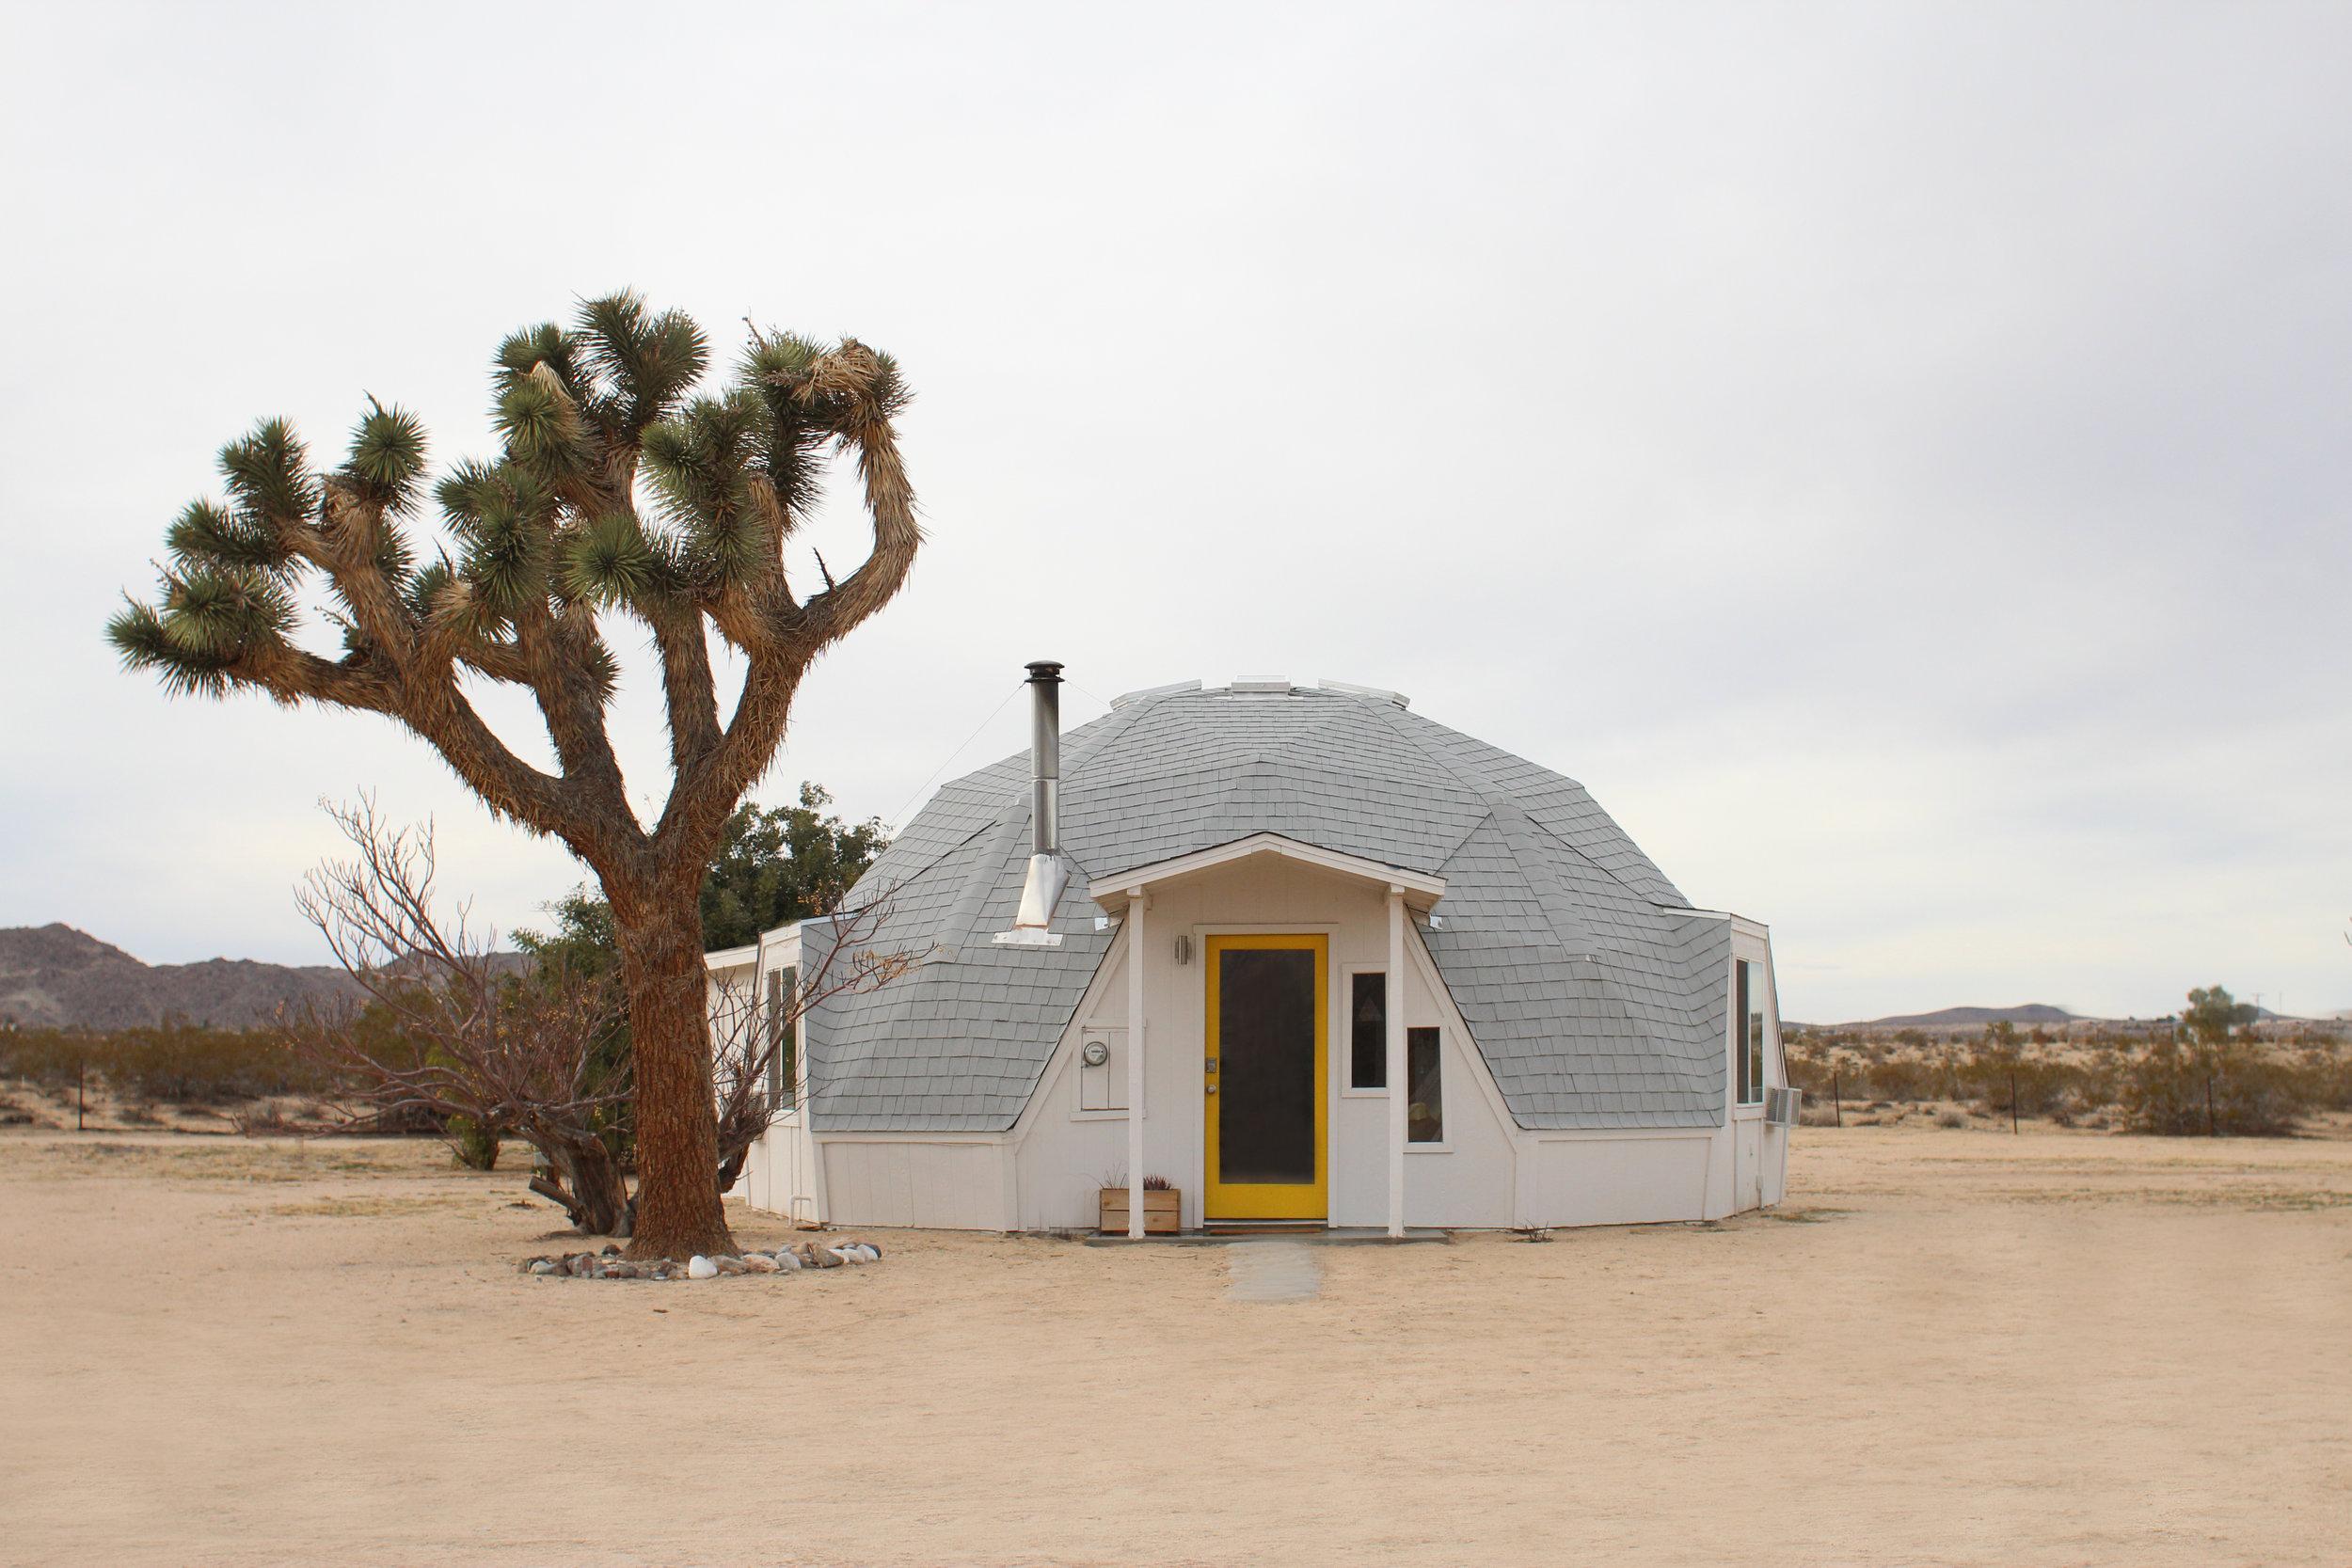 Dome in the Desert // www.weareinourelement.com